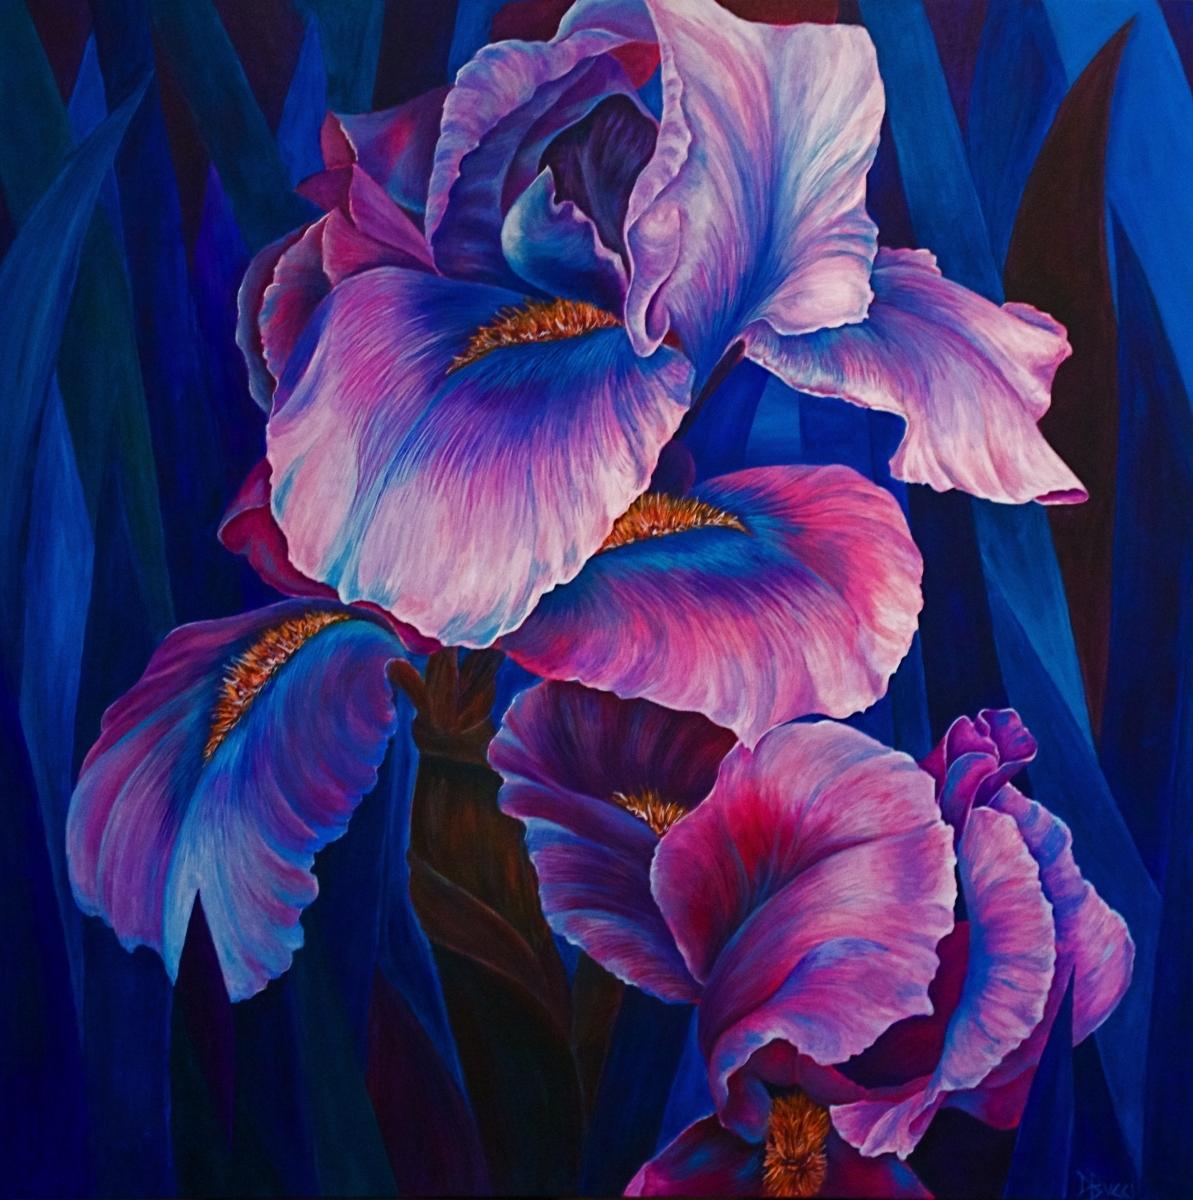 Iris, Iris painting, Iris artwork, blue, purple, pink, floral, flower,  nature, colorful, big painting, big artwork, gorgeous, magnificent, beautiful, debra bucci, debbie bucci,flower, floral, Debra Bucci, original, artwork, DBucci, Debbie, Debra, Bucci,  (large view)